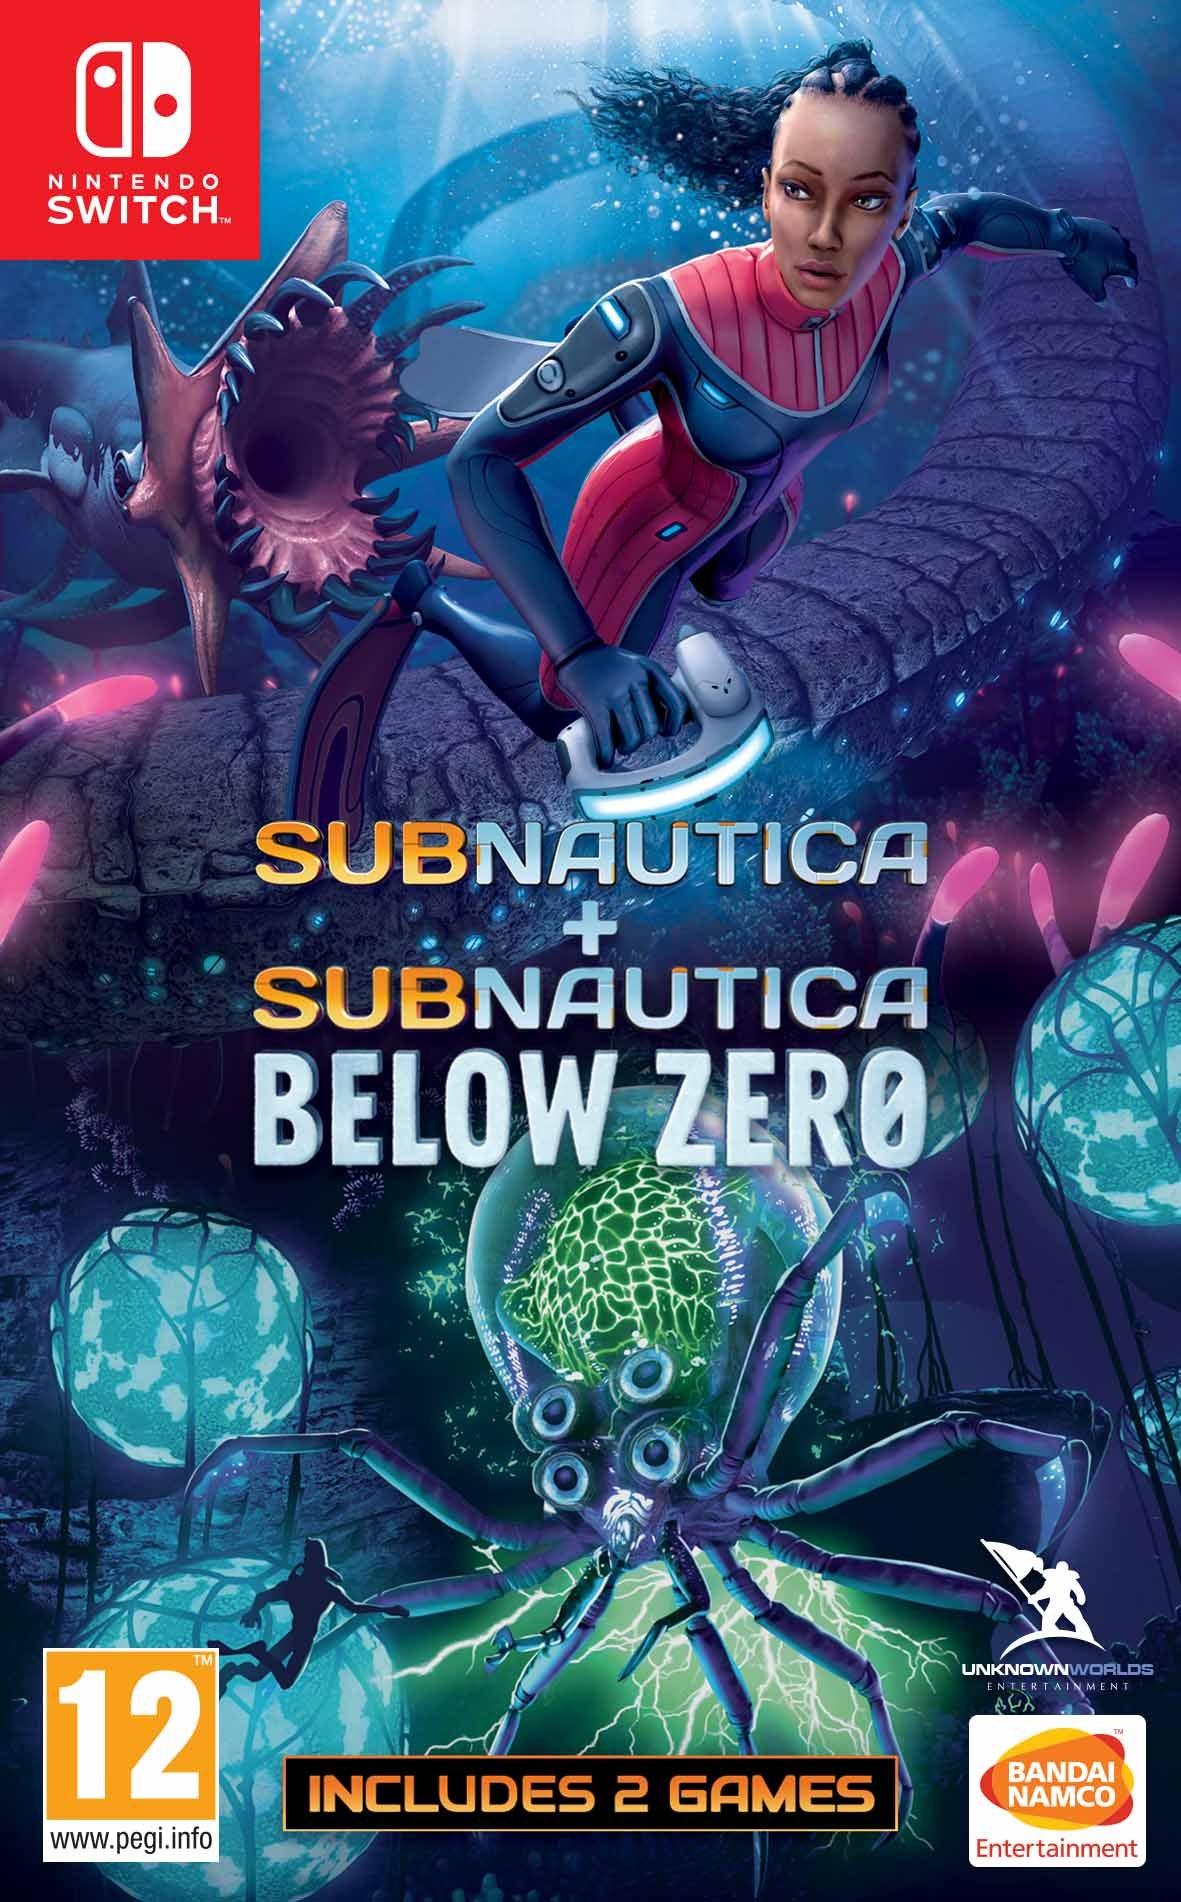 Subnautica + Subnautica Below Zero Nintendo Switch Game